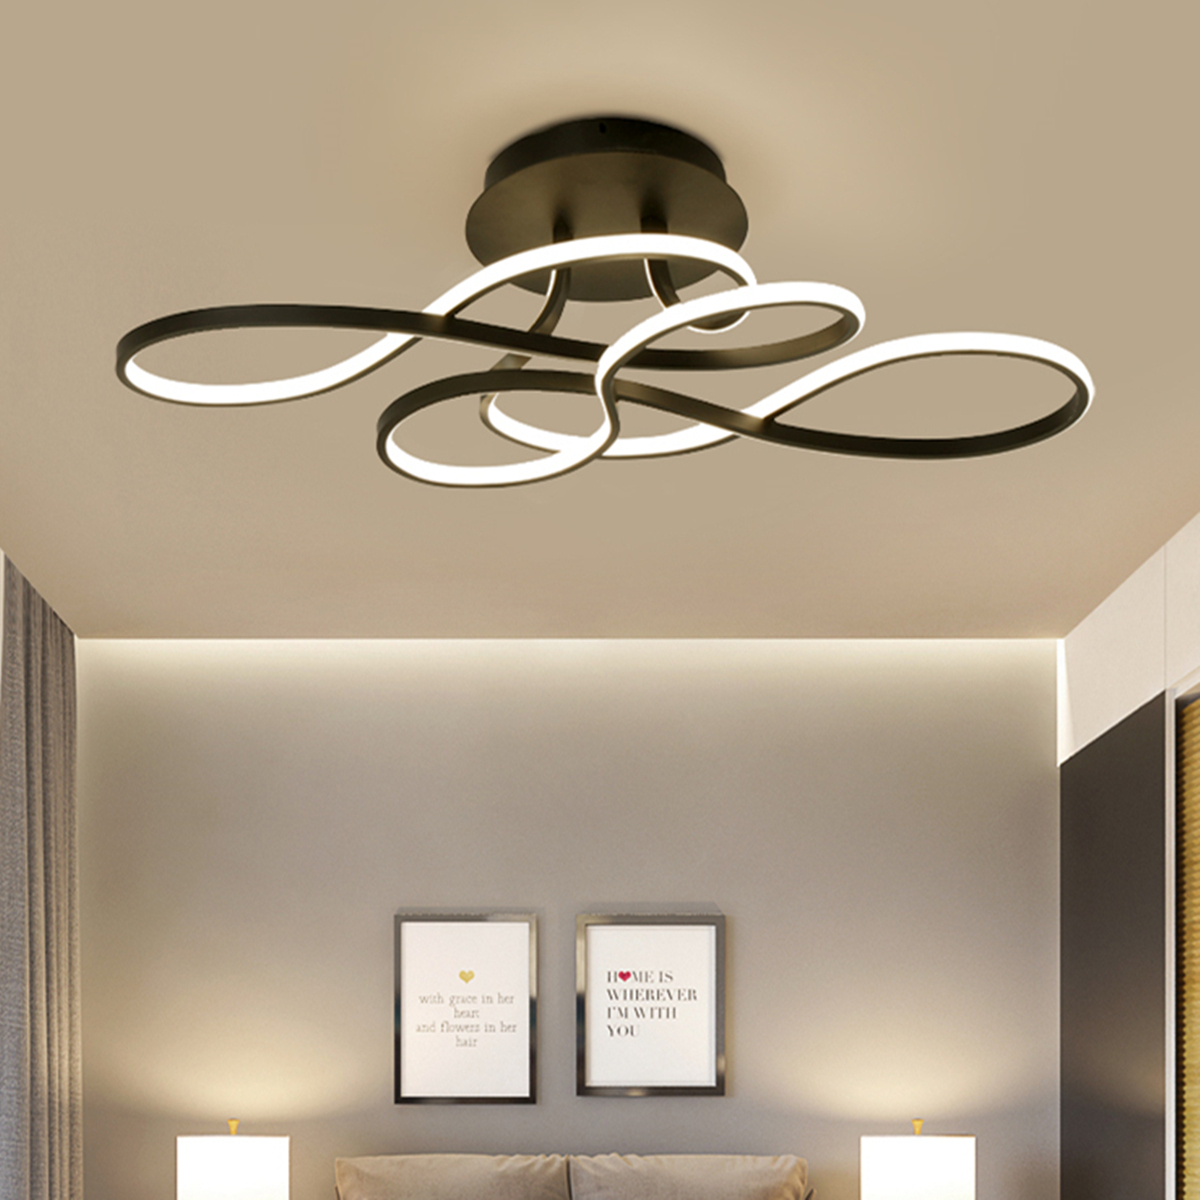 Meigar 110v Led Modern Acrylic Chandelier Living Room Ceiling Light Pendant Lamp Fixtur Walmart Canada